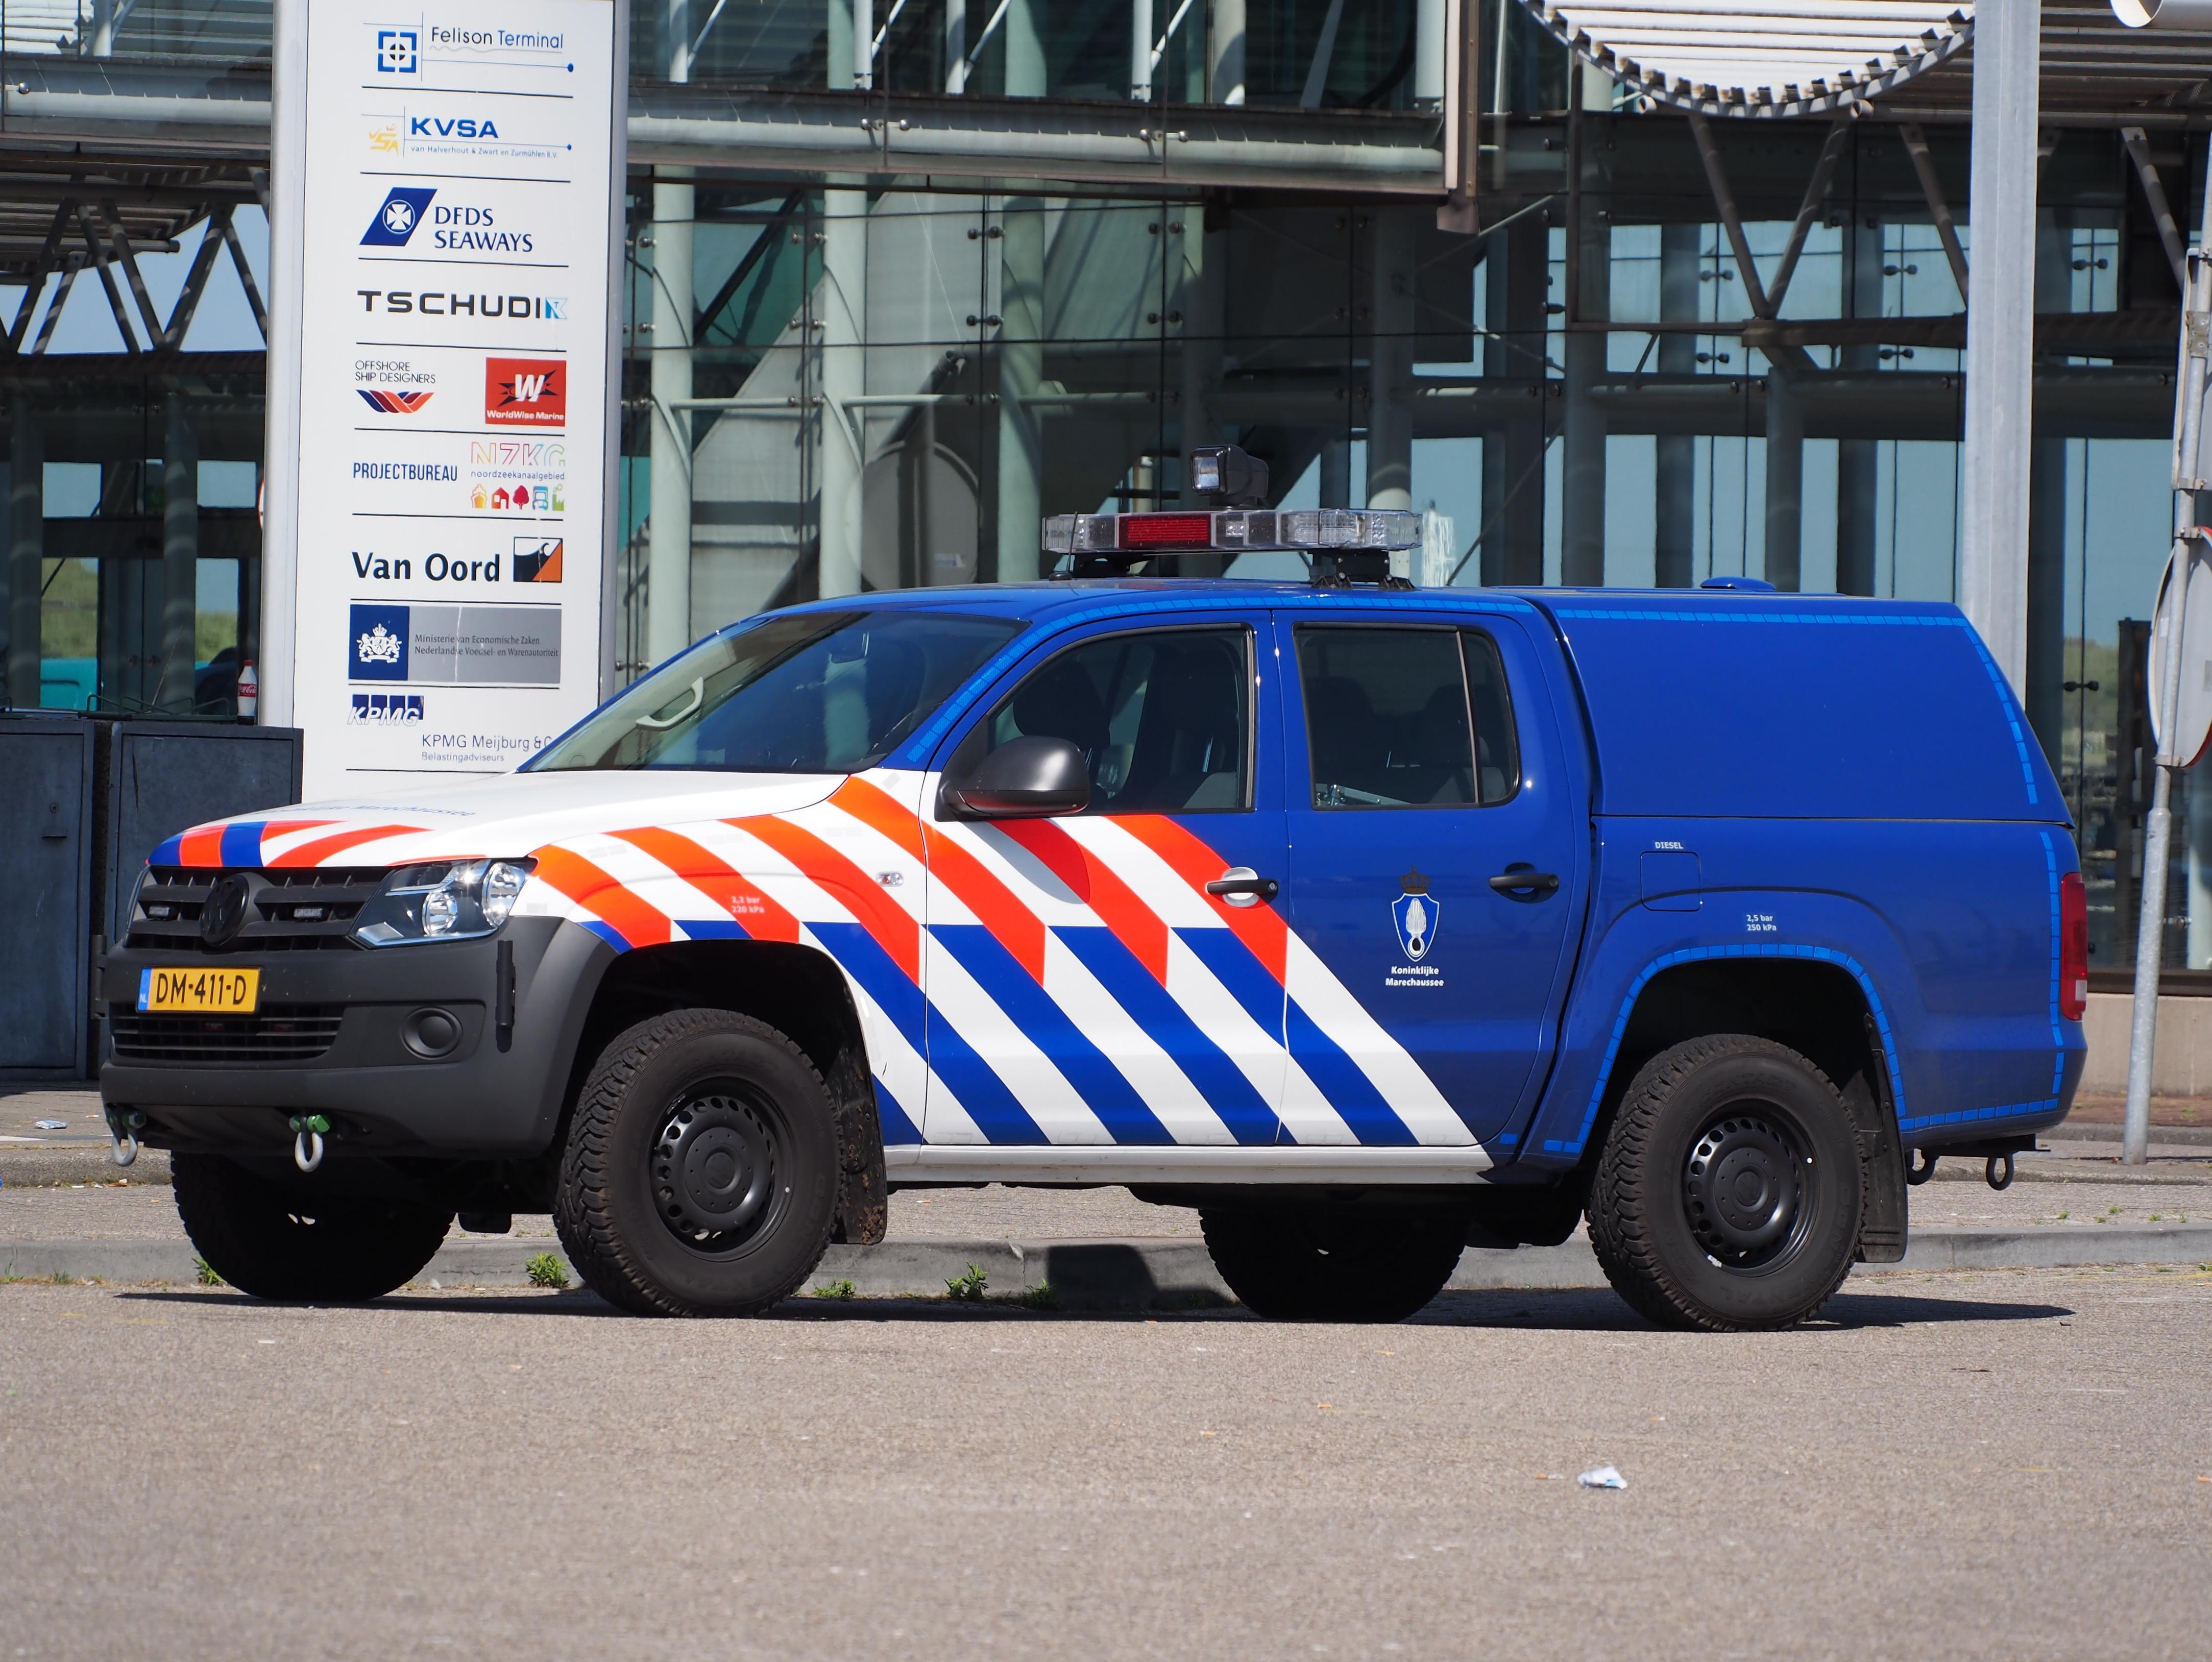 filevolkswagen koninklijke marechaussee ijmuidenjpg wikimedia commons